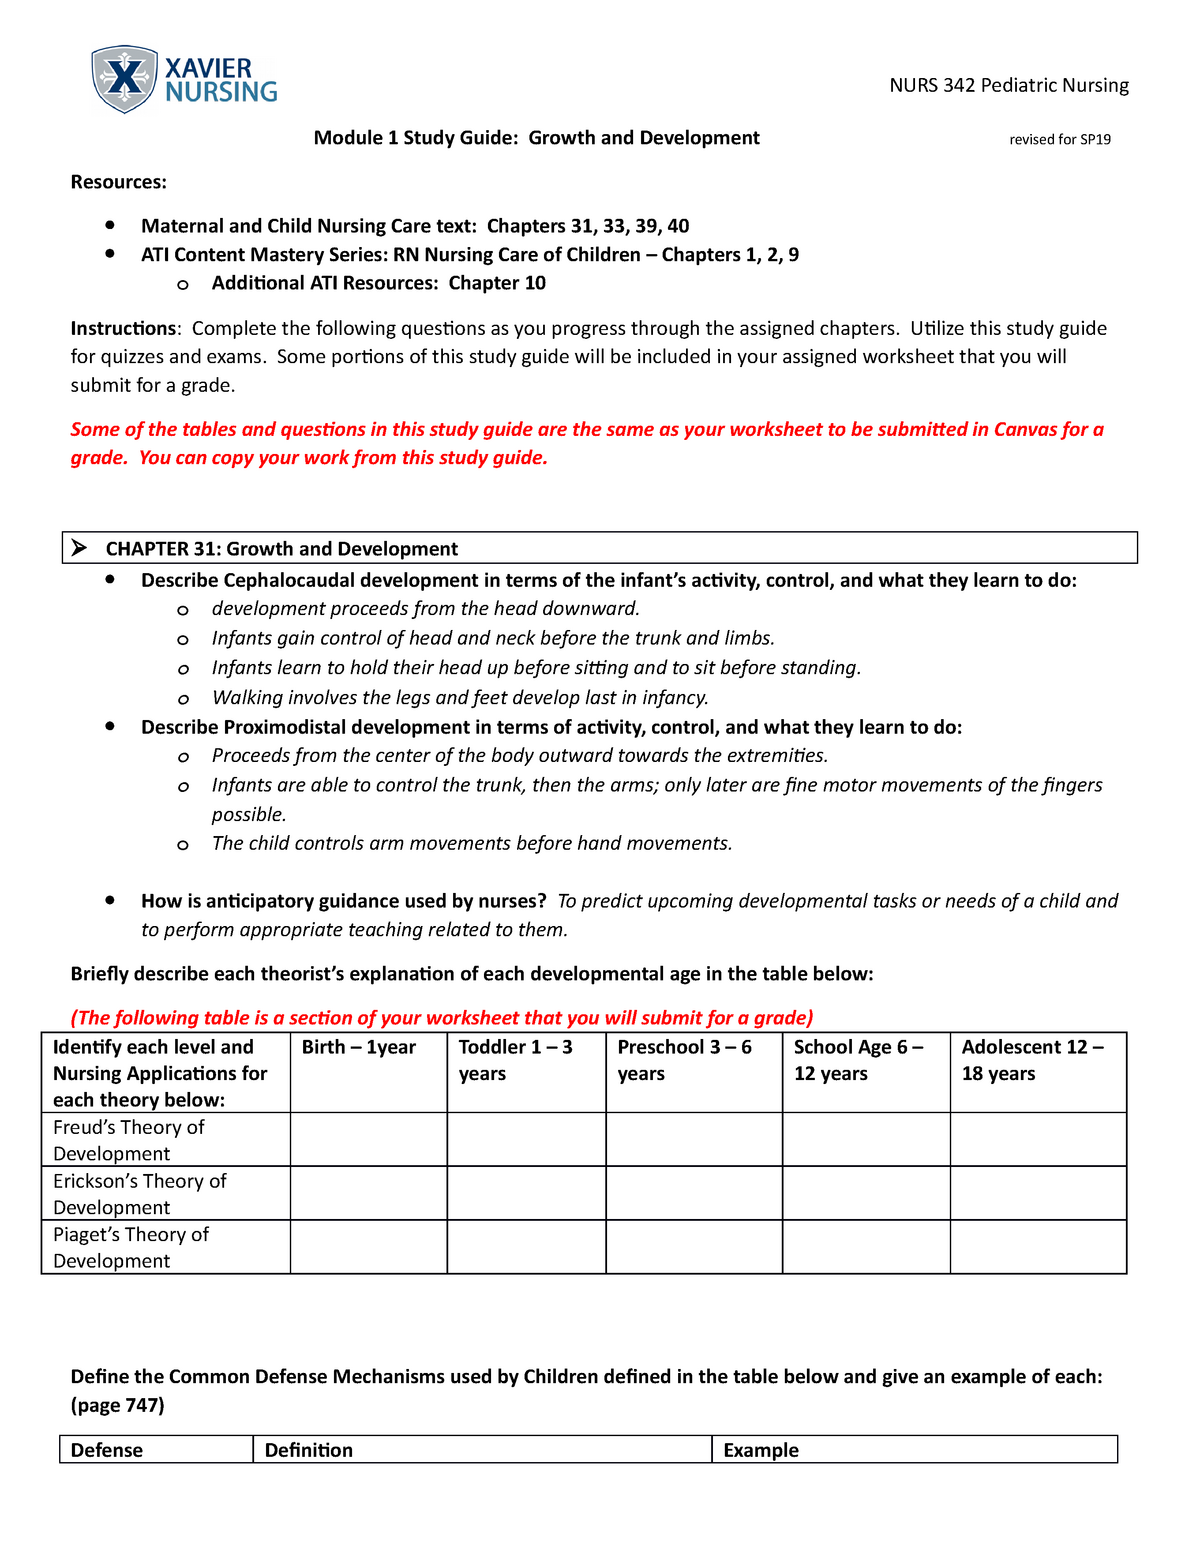 Module 1 Study Guide Nurs 342 Pediatric Nursing Xavier Studocu